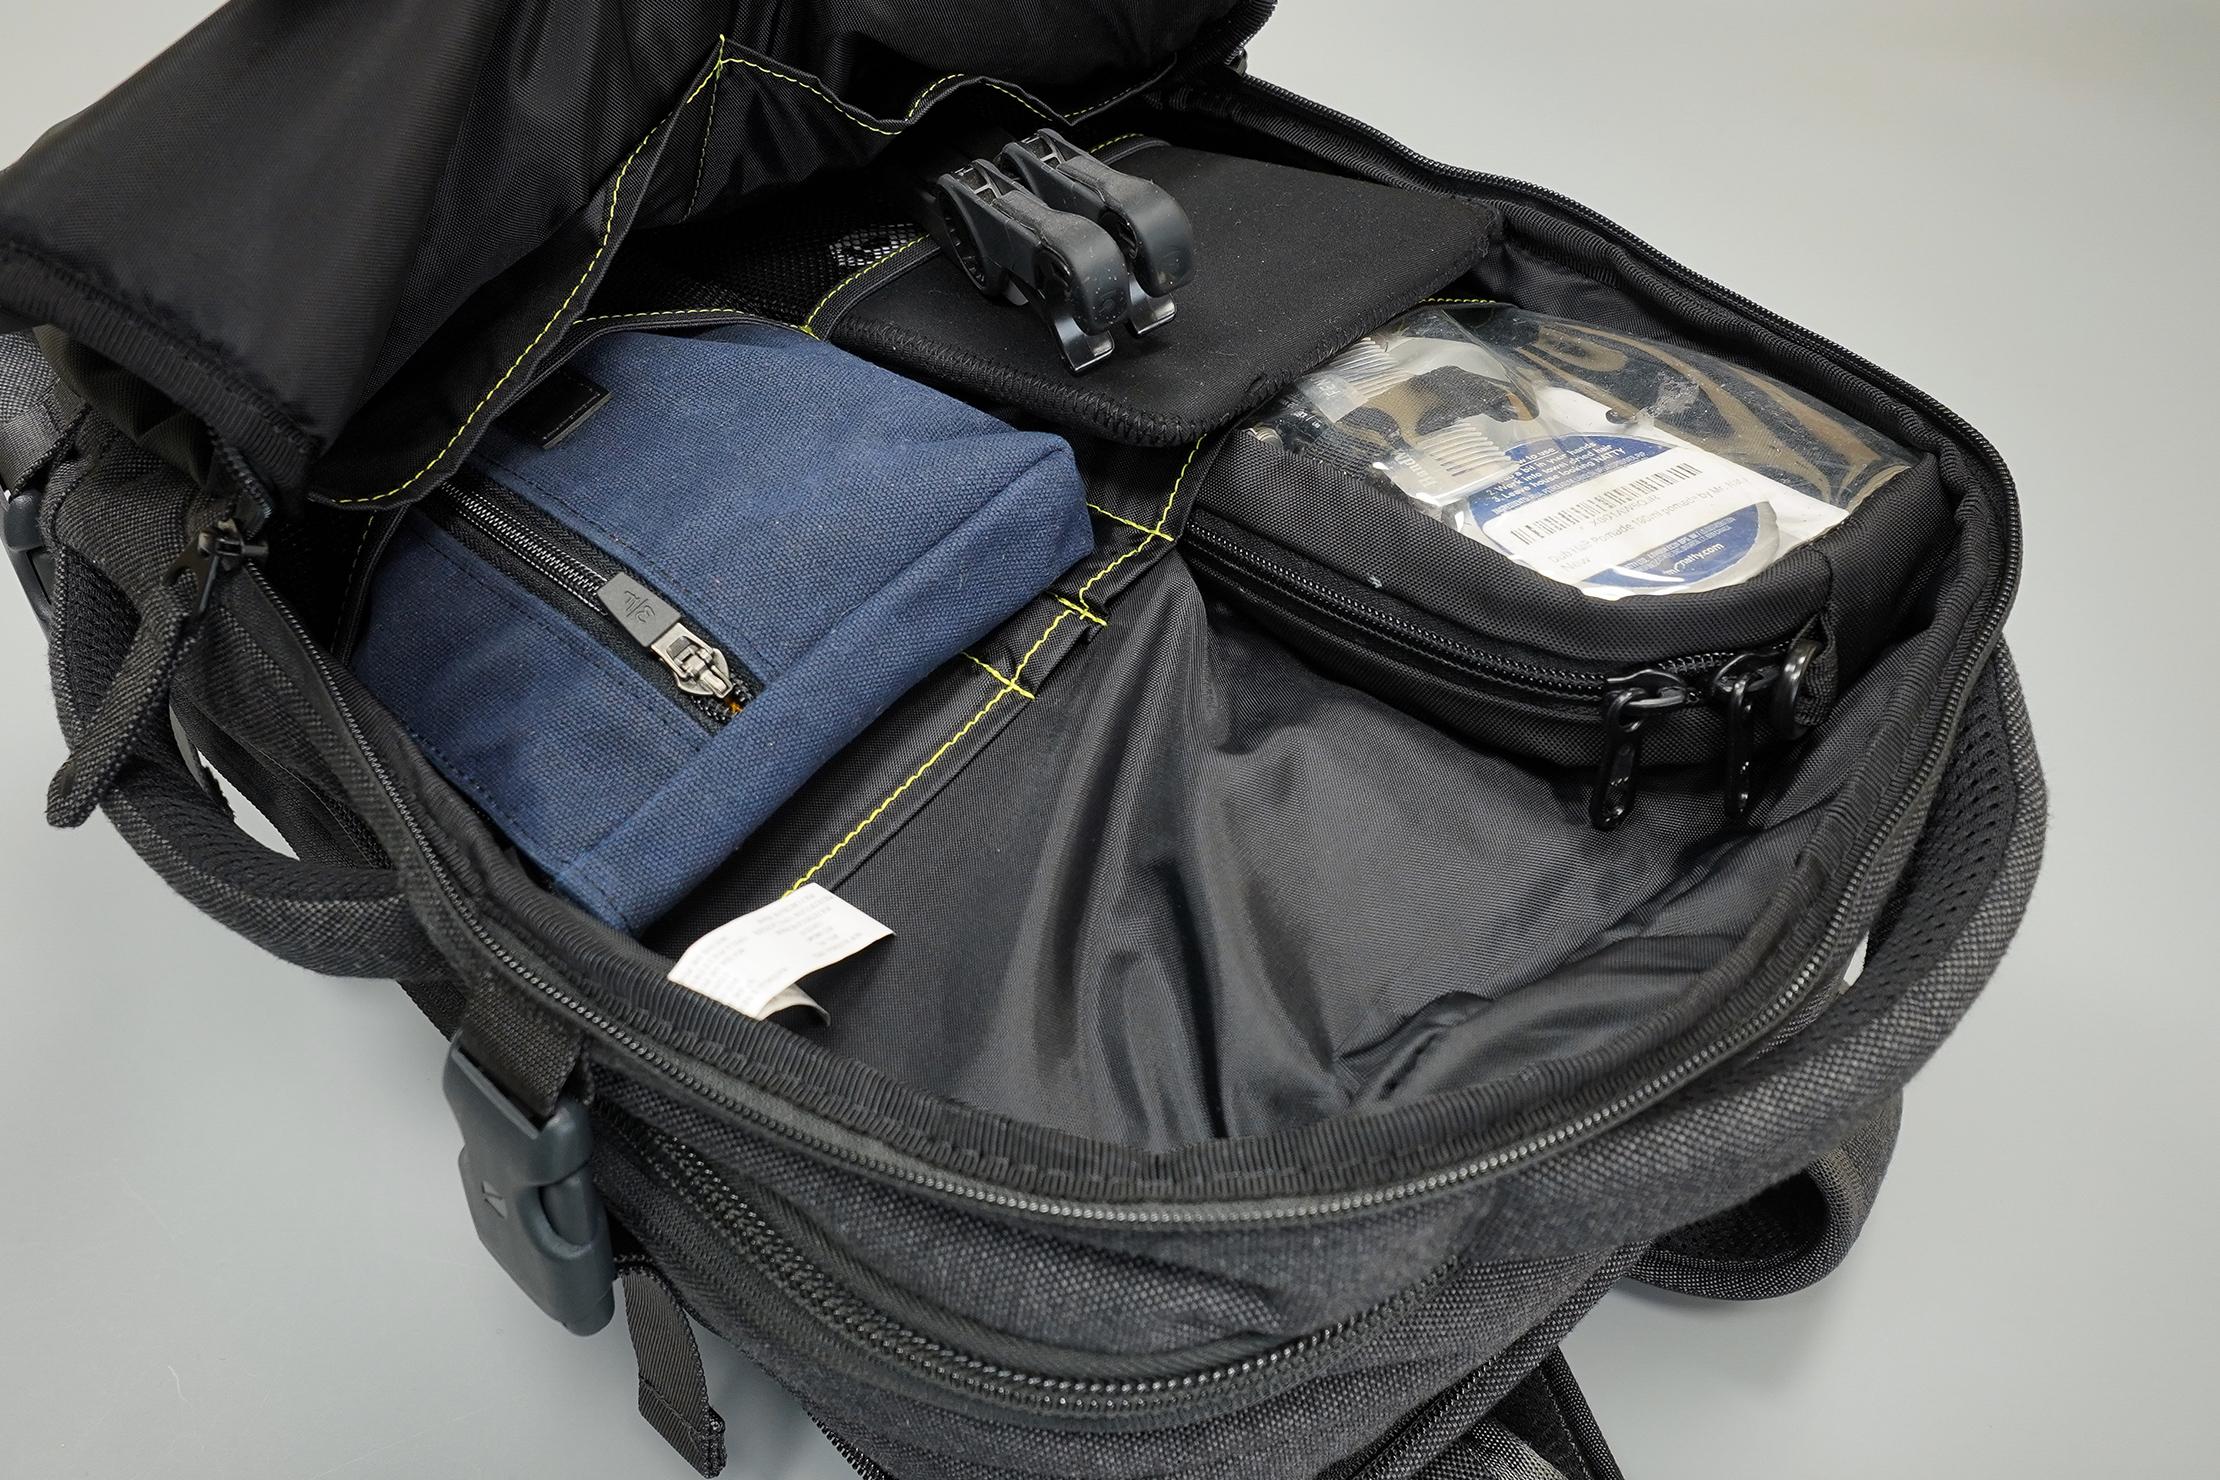 Incase EO Travel Backpack Front Pocket Organization